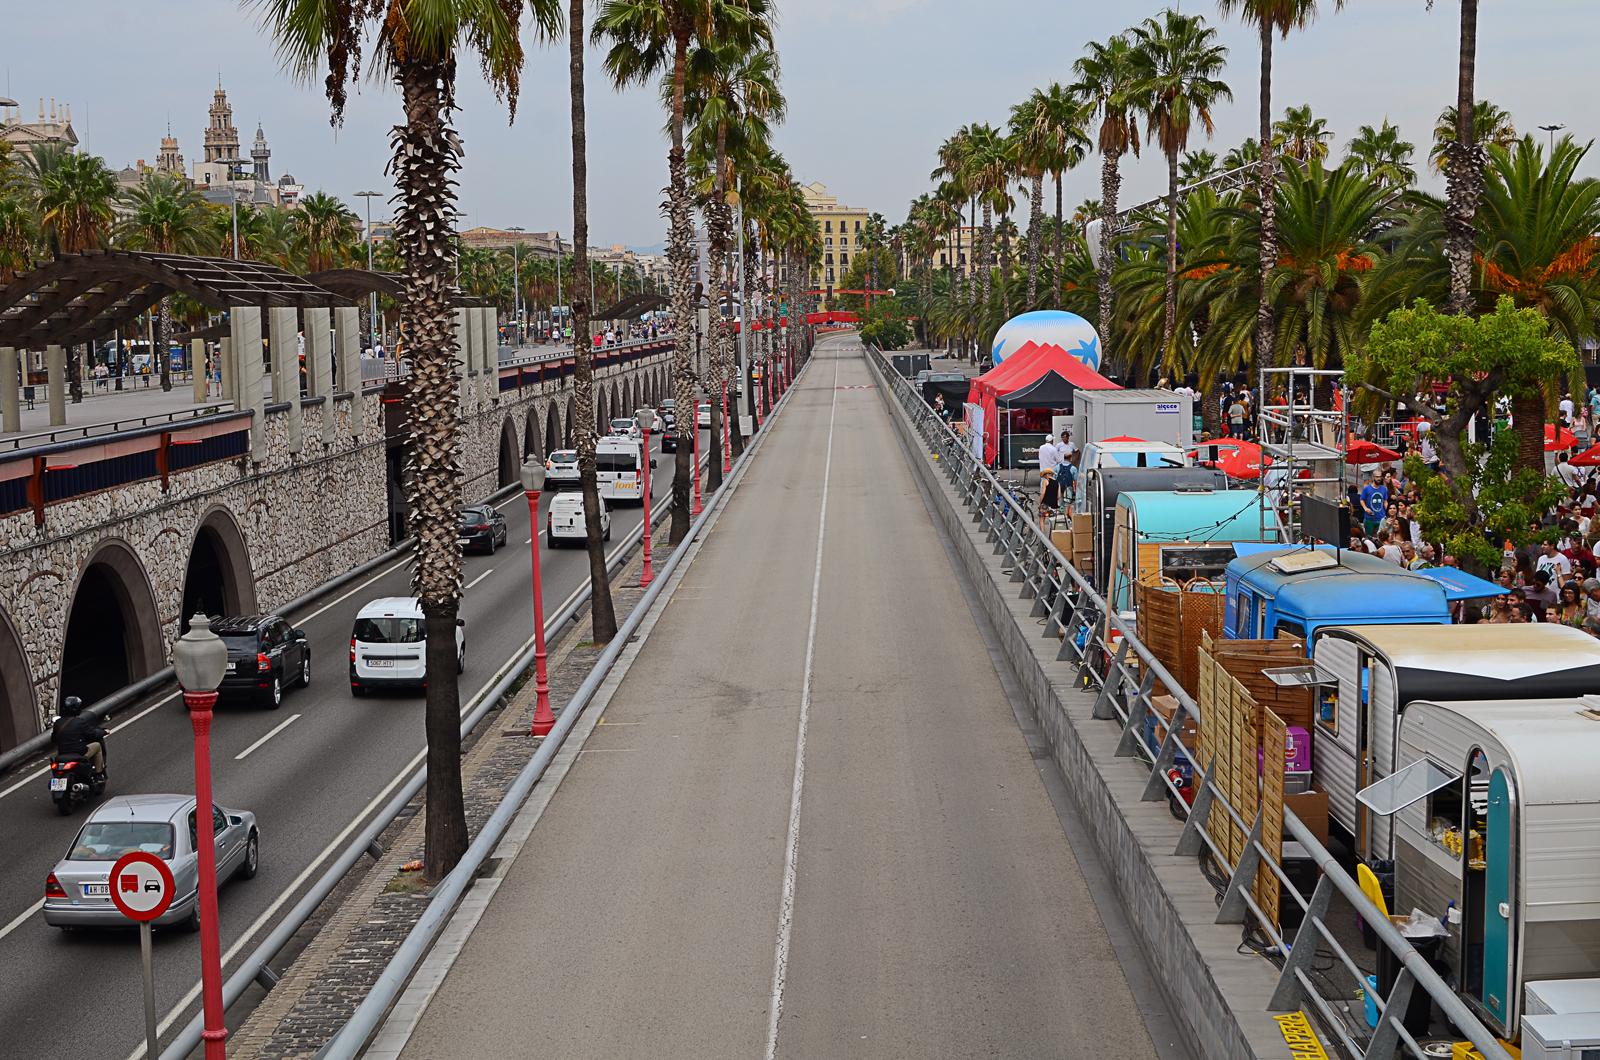 Moll de la Fusta, Barcelona